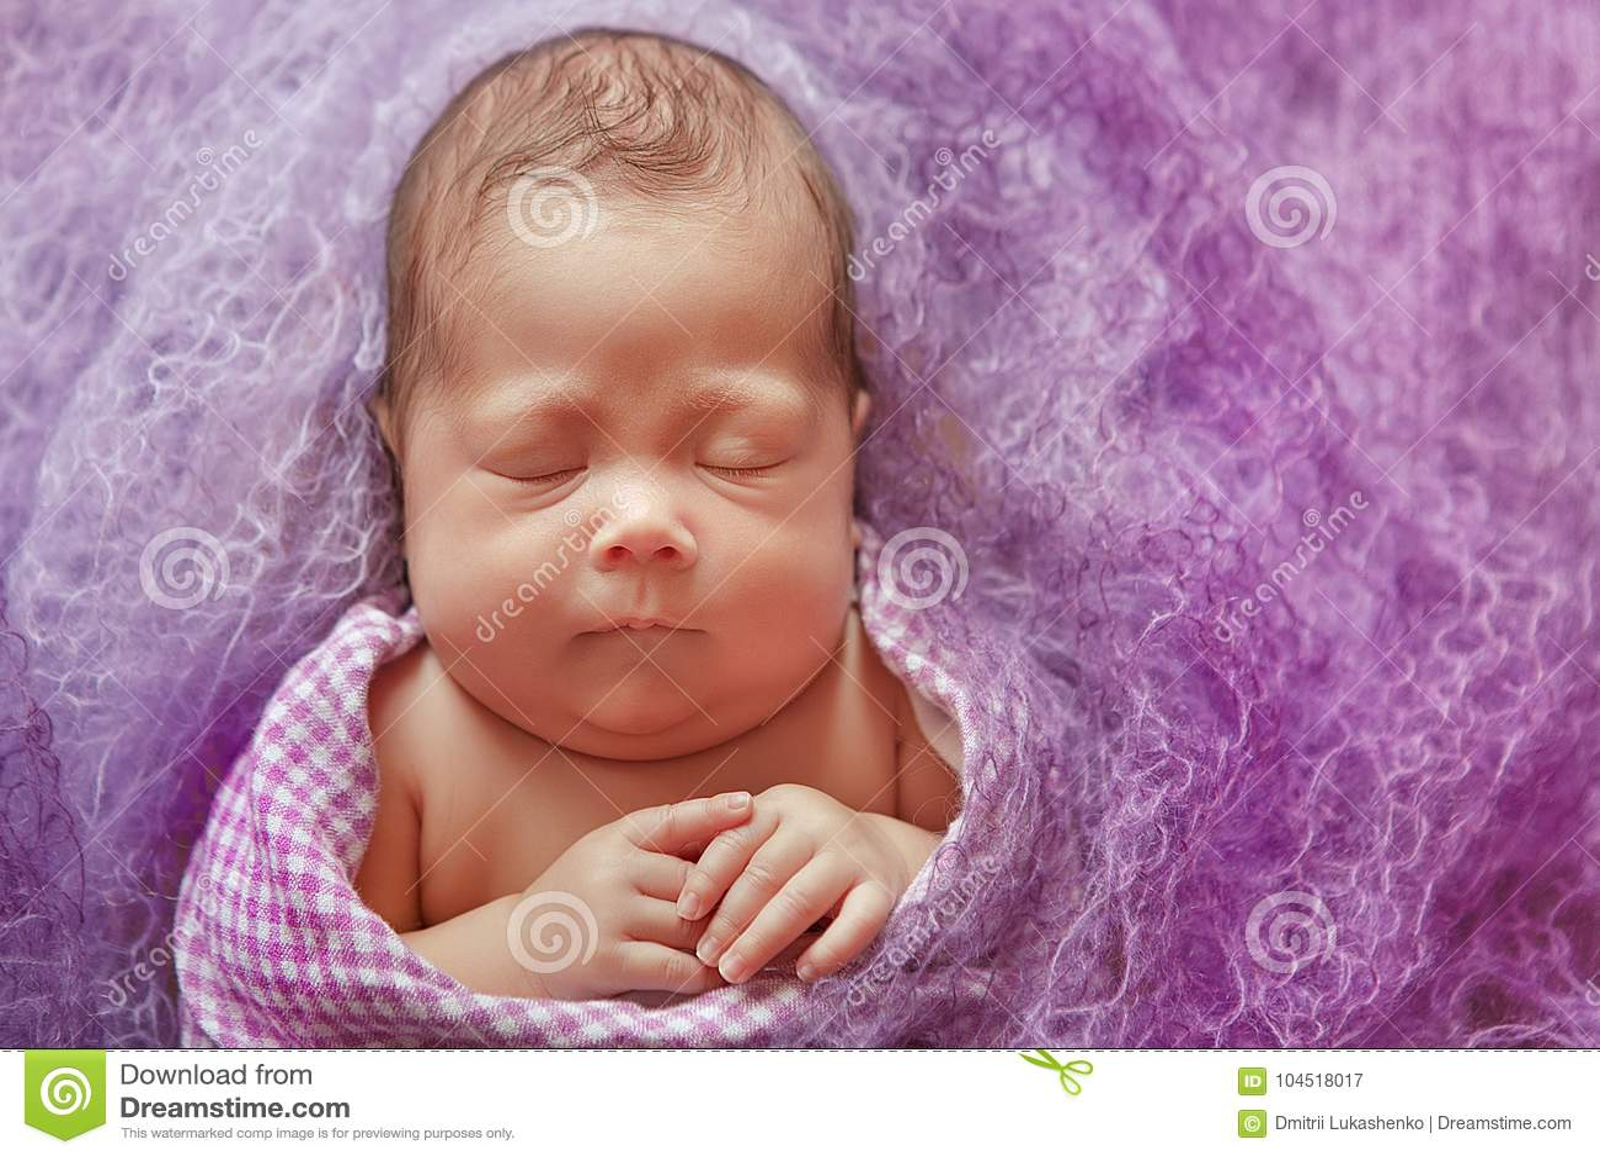 bf08db95b Newborn Baby Tender Sleeping On Wool Couturier Blanket. Pure Human ...